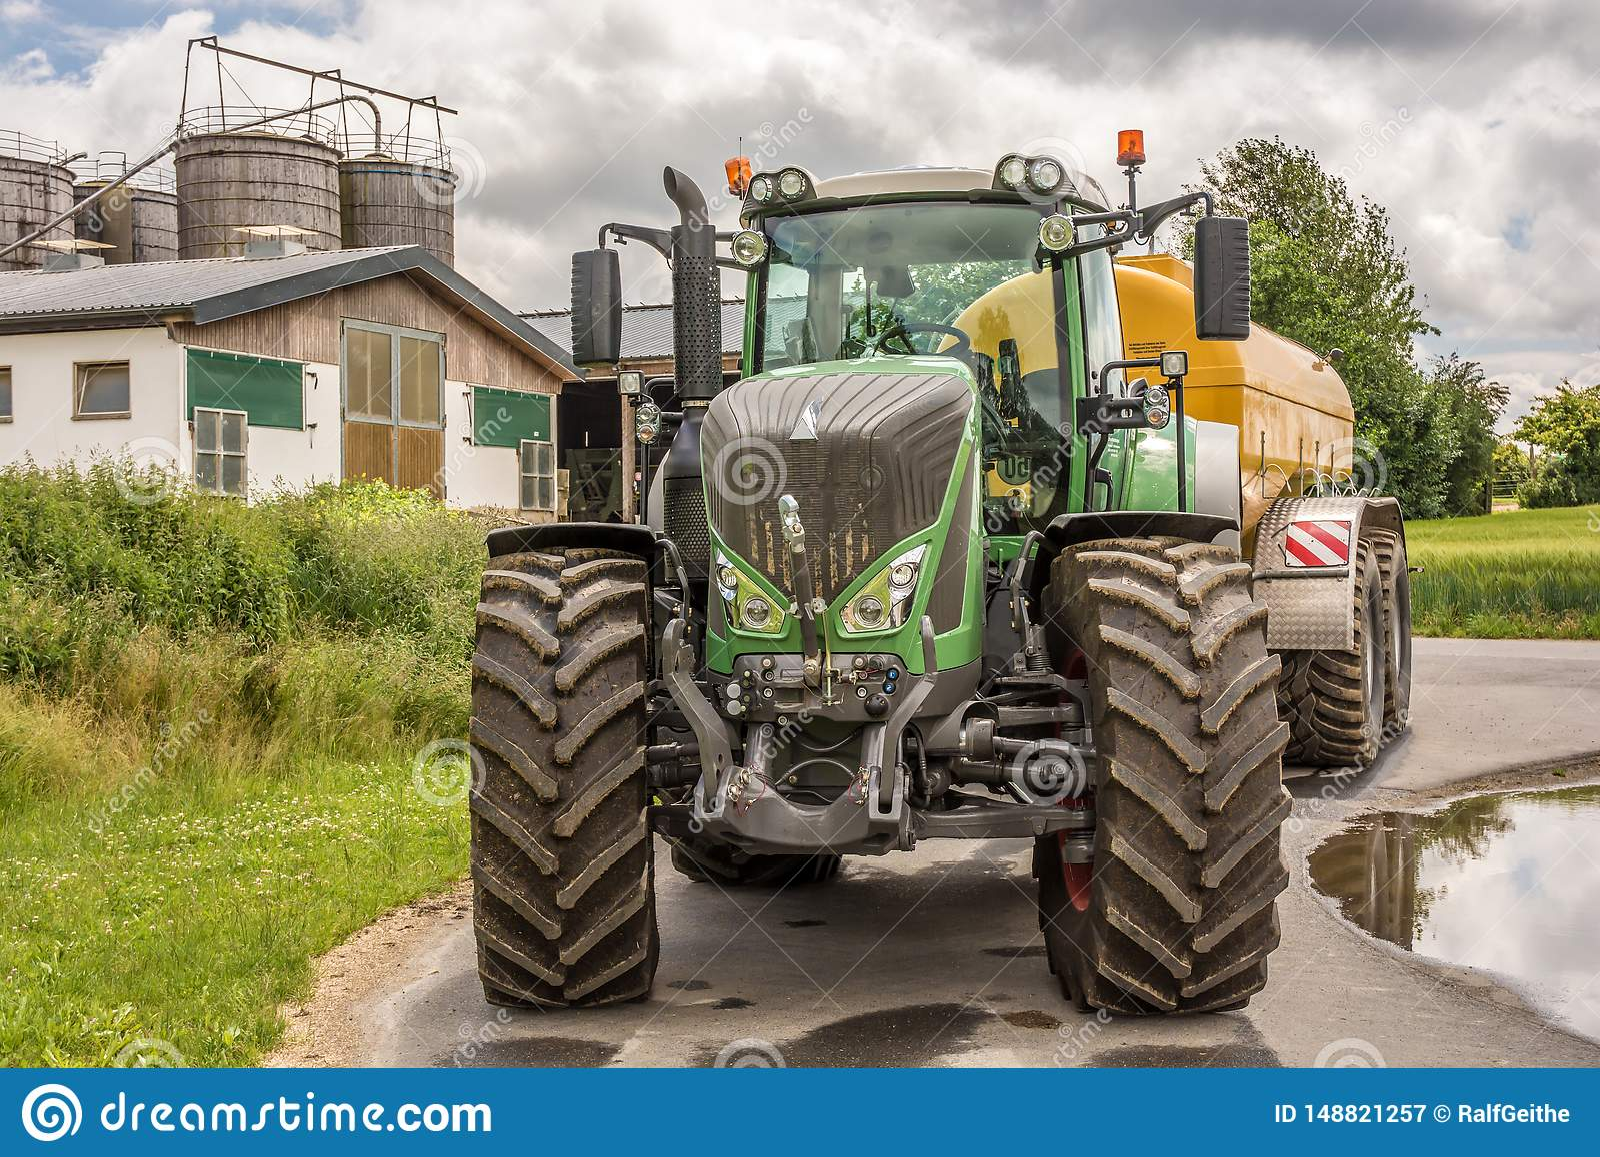 Stor bastant traktor med lantgården i bakgrunden